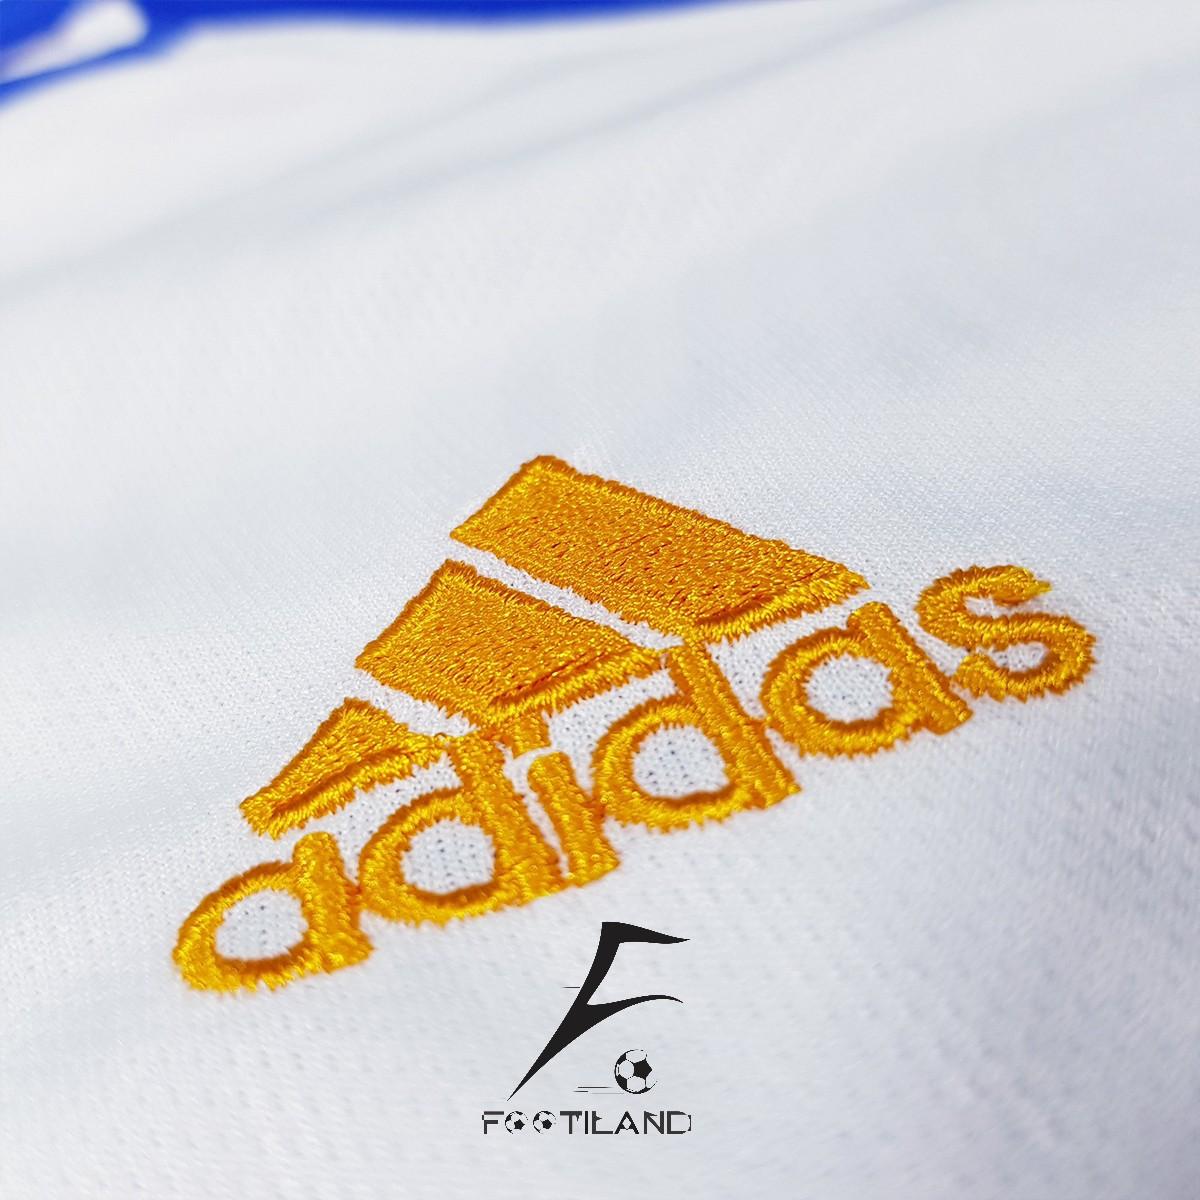 لباس بچگانه رئال مادرید 2022